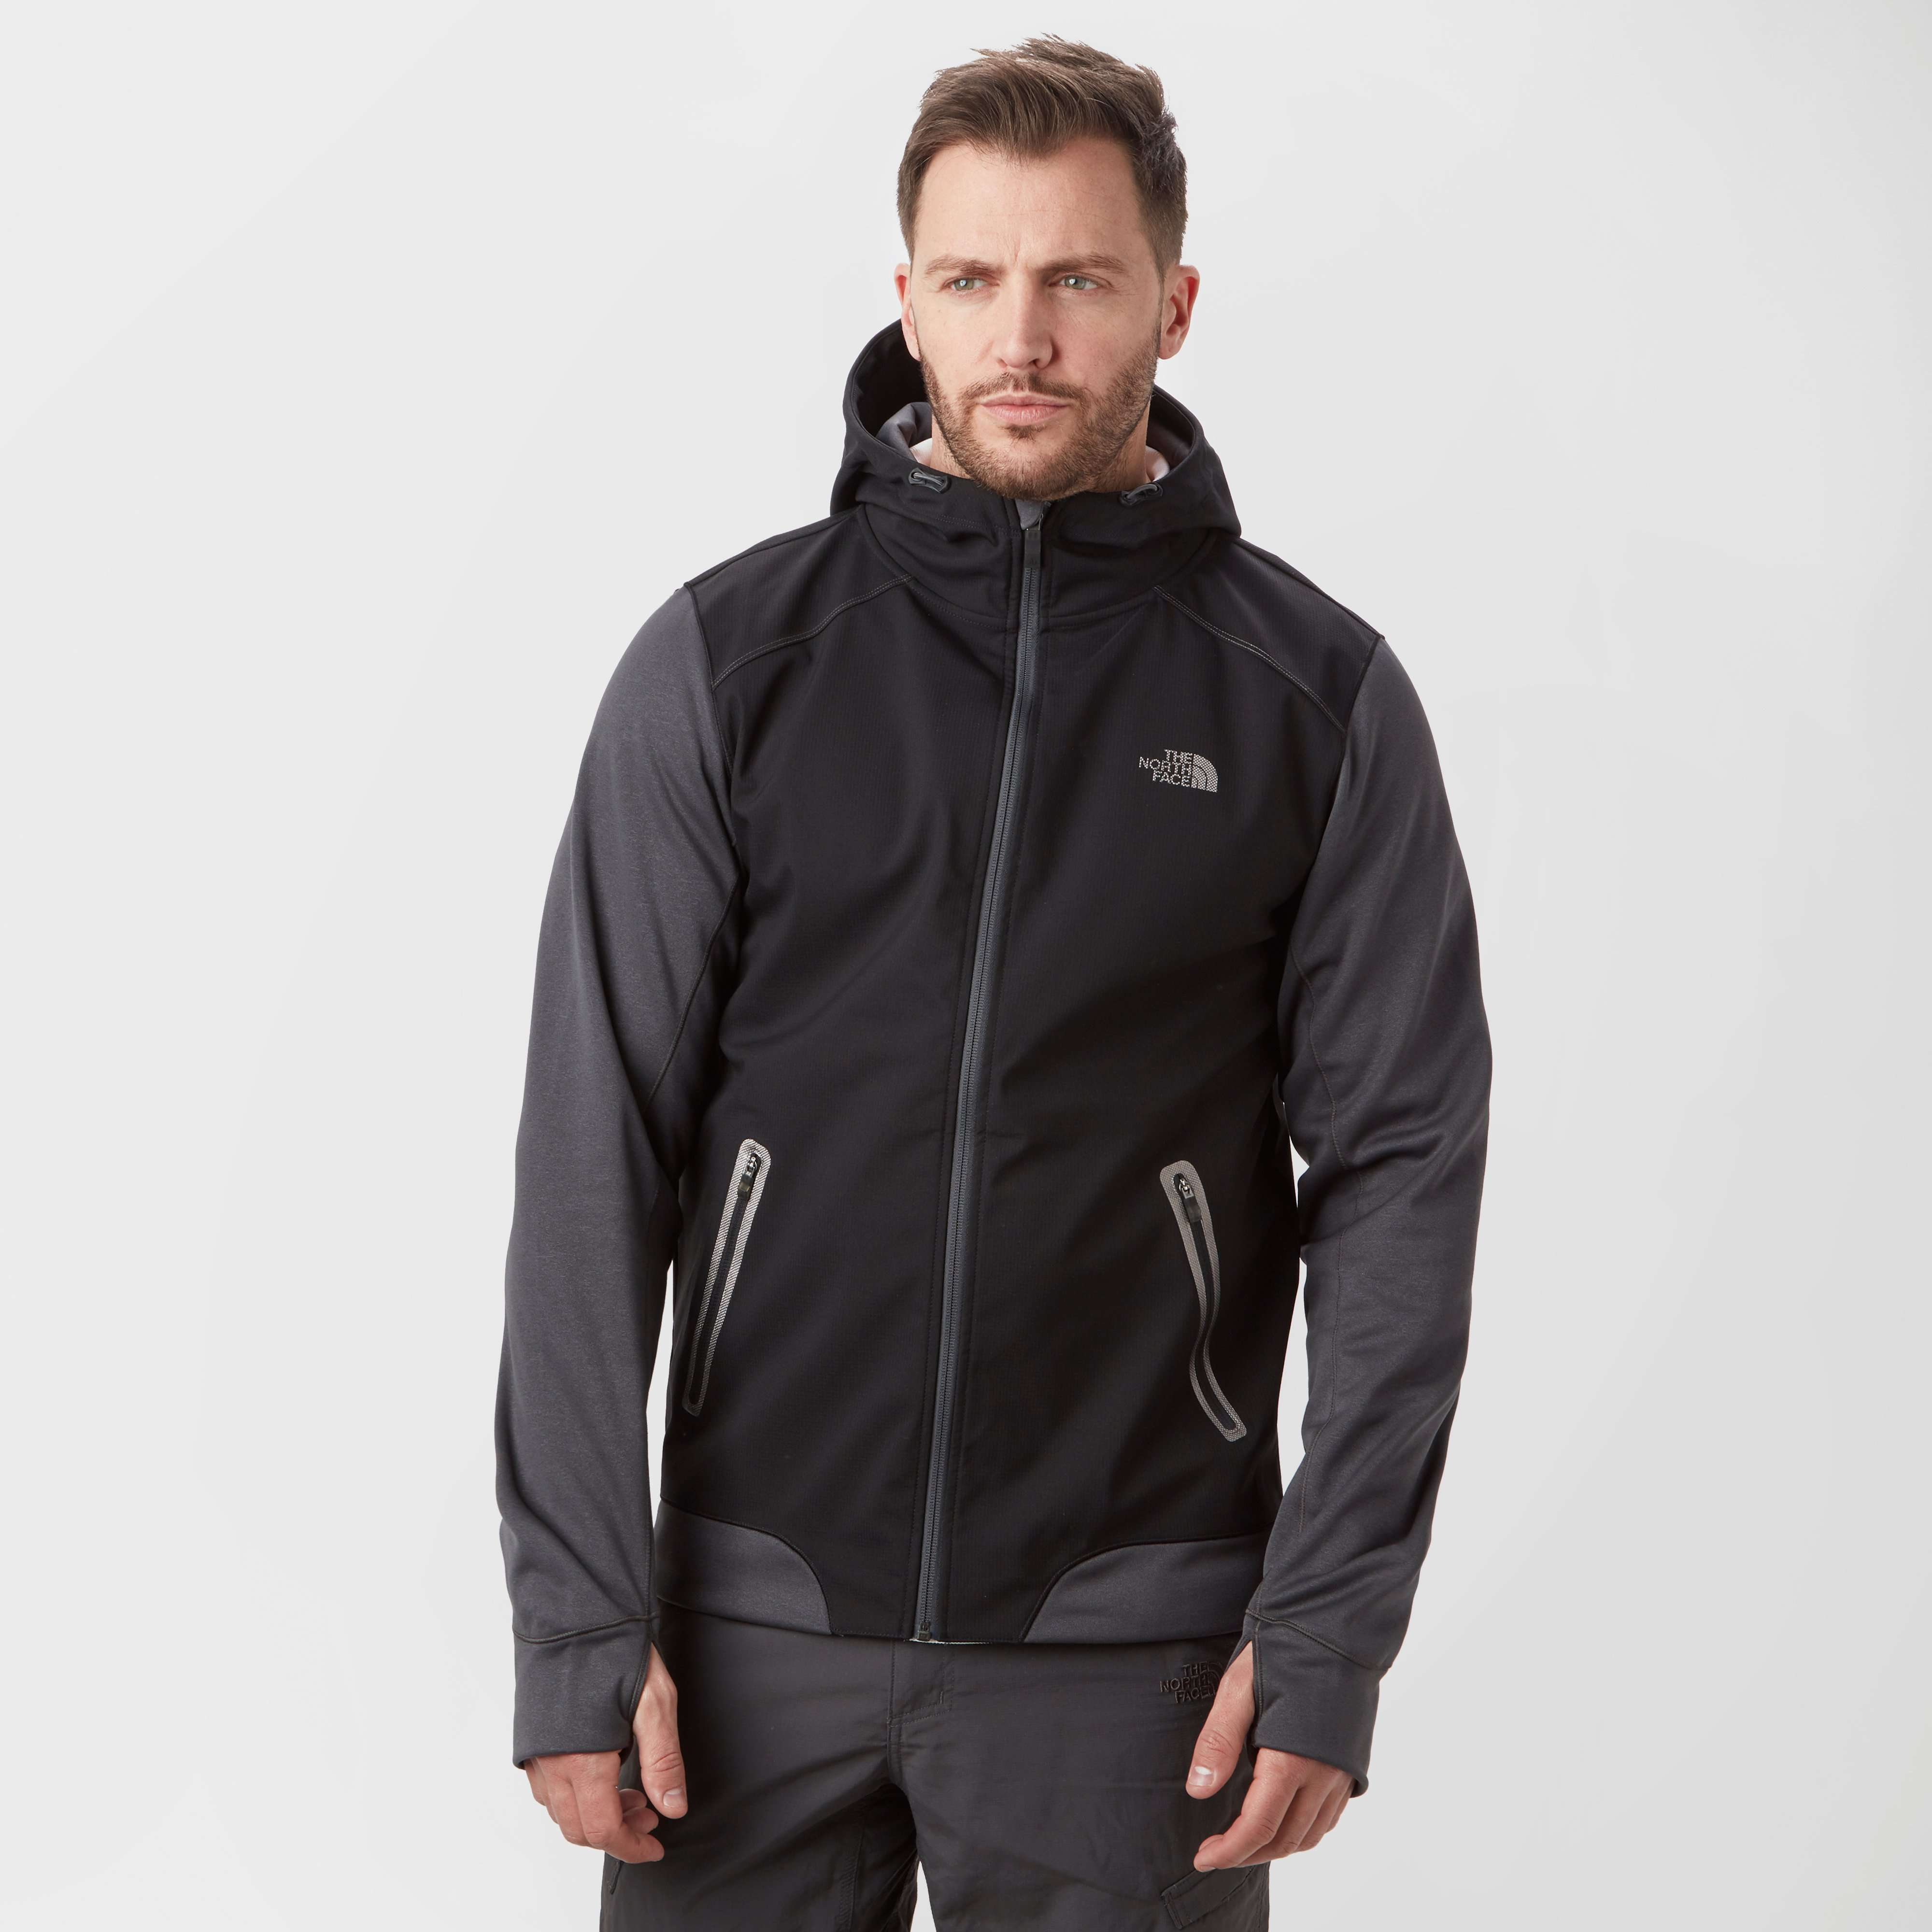 THE NORTH FACE Men's Mountain Athletics Kilowatt Varsity Jacket